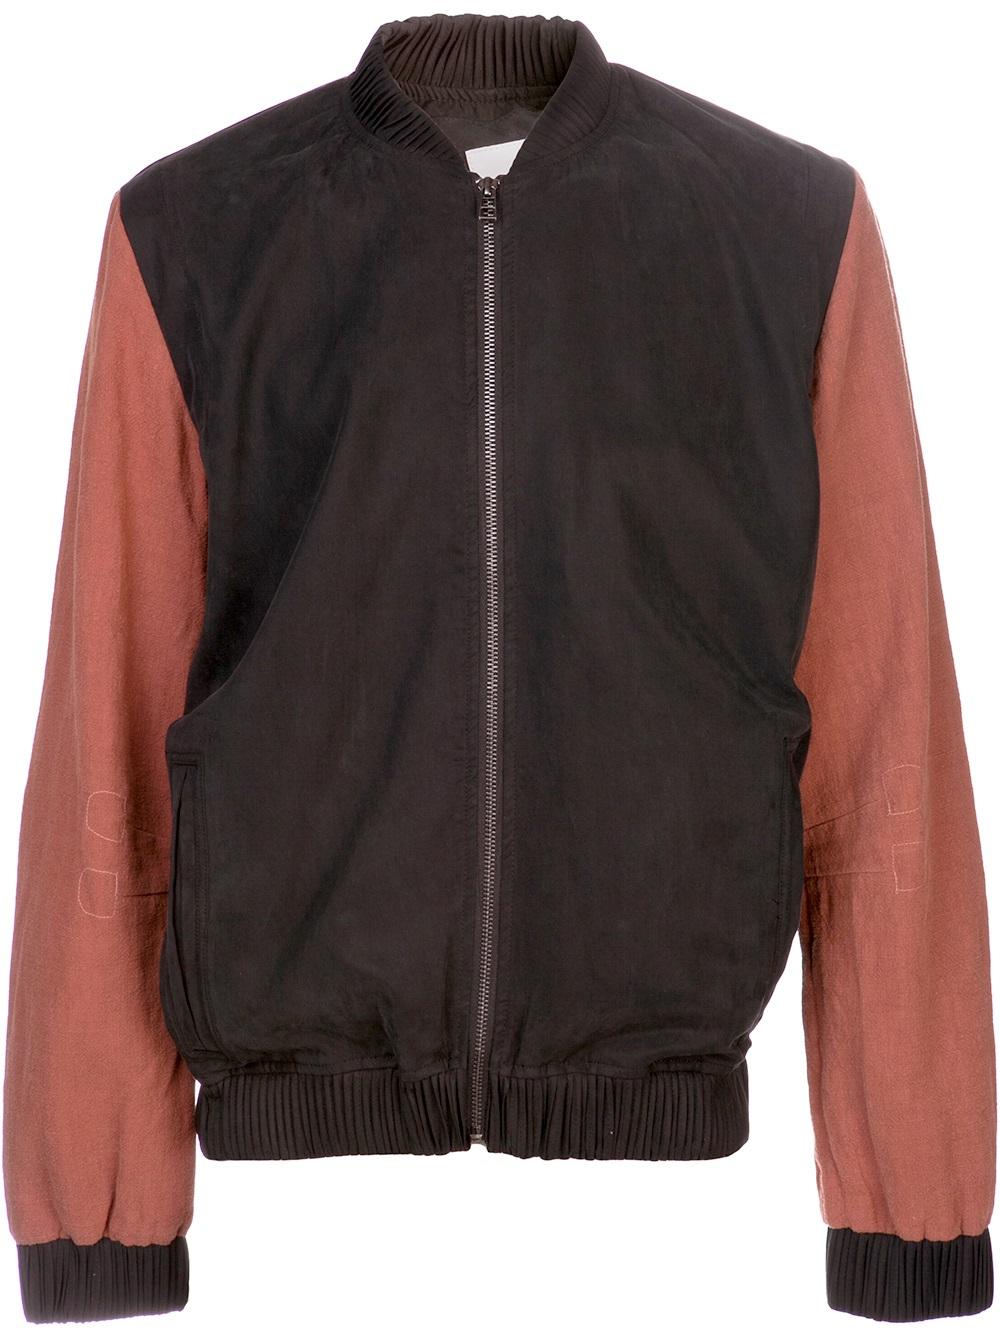 Chapter Maro Jacket In Black For Men | Lyst